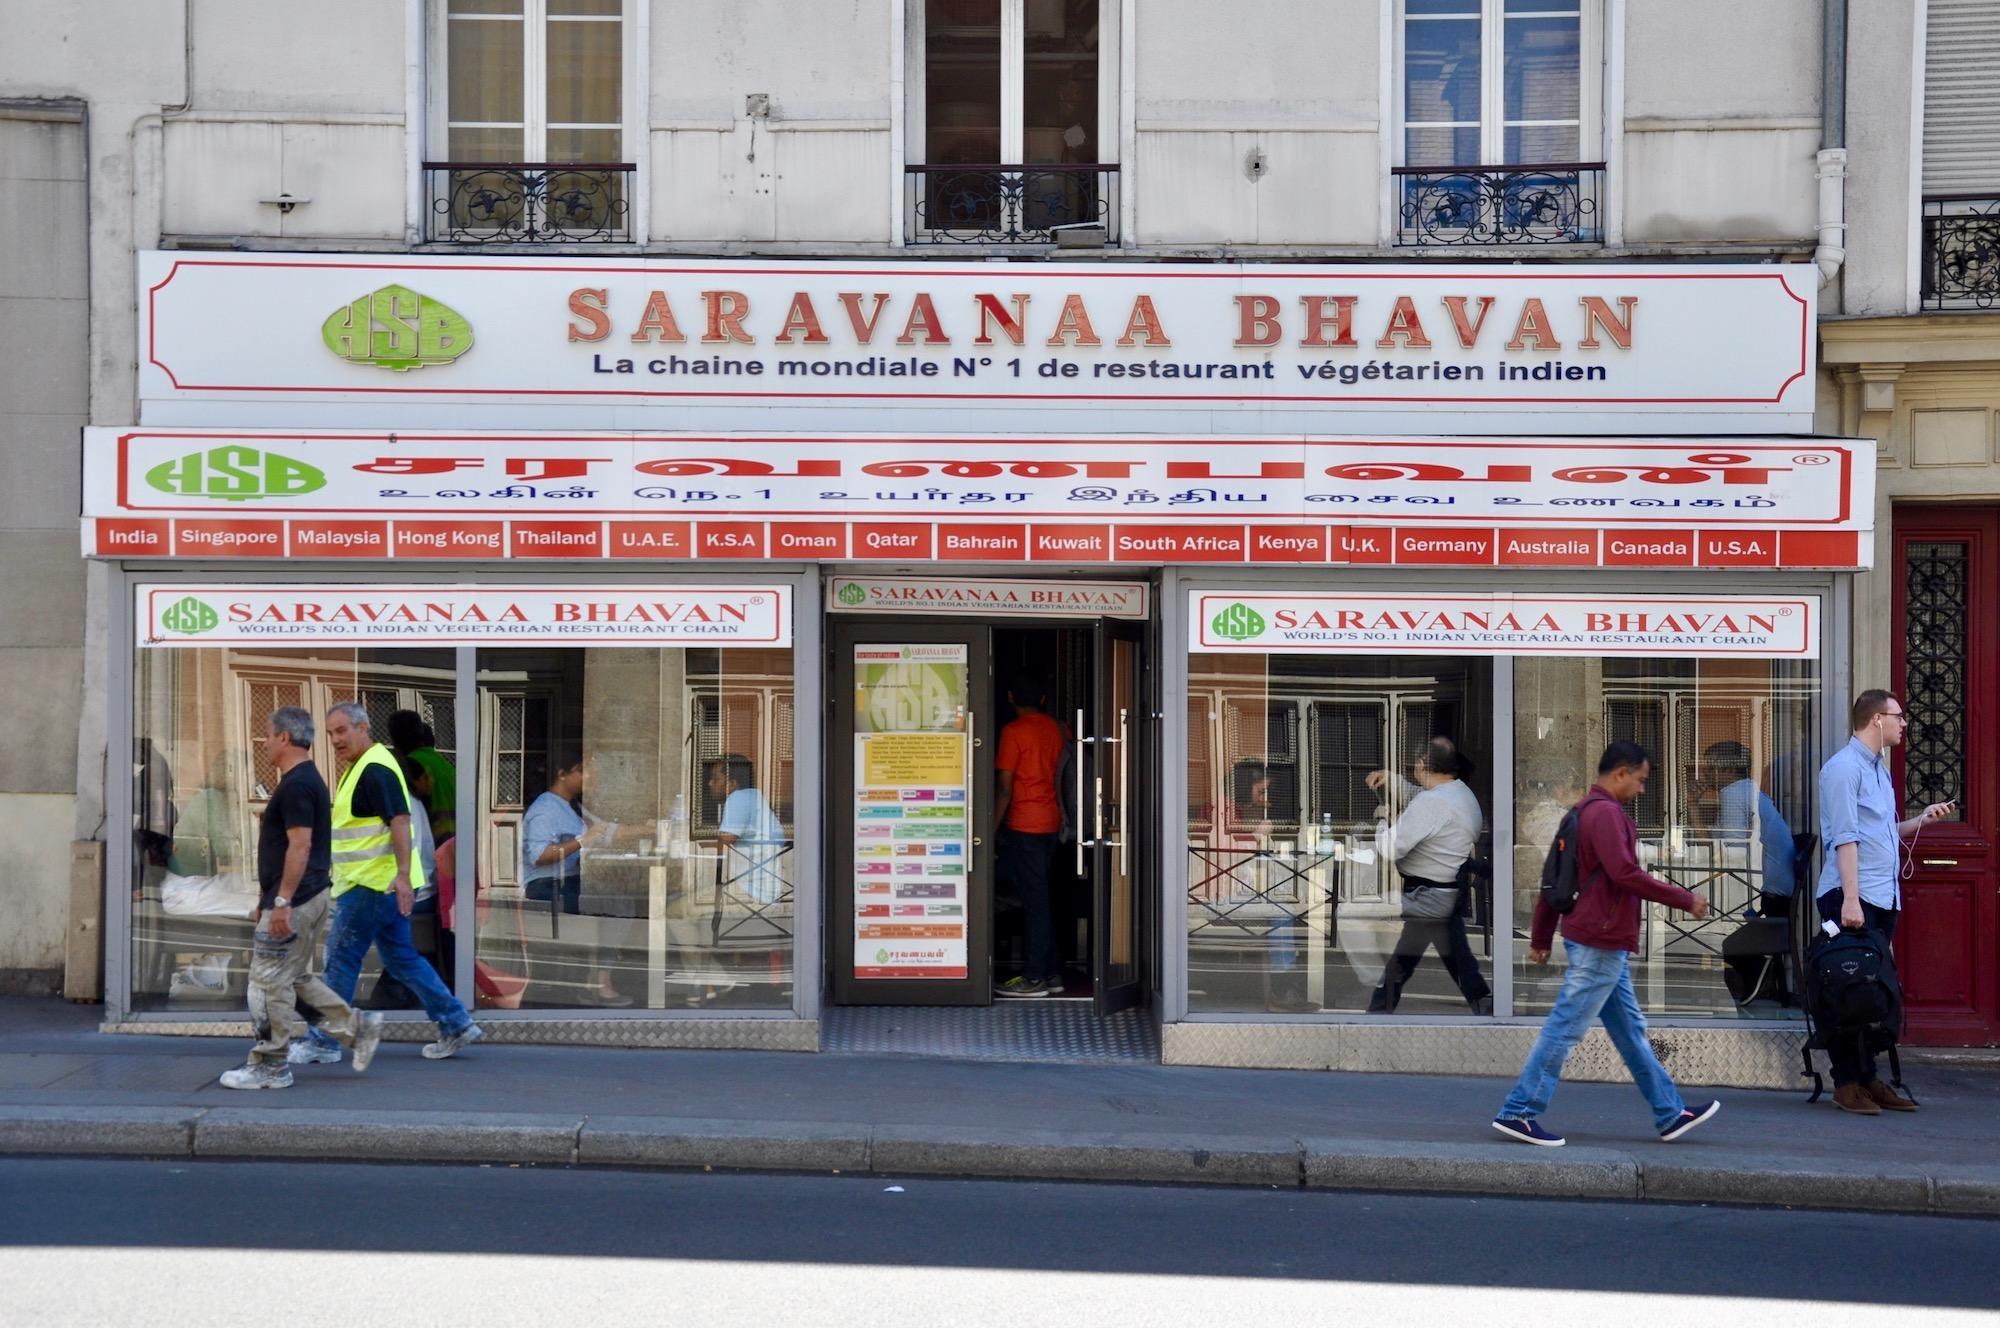 For vegetarian food in Paris, a favorite restaurant close to Gare du Nord is Saravanaa Bhavan.